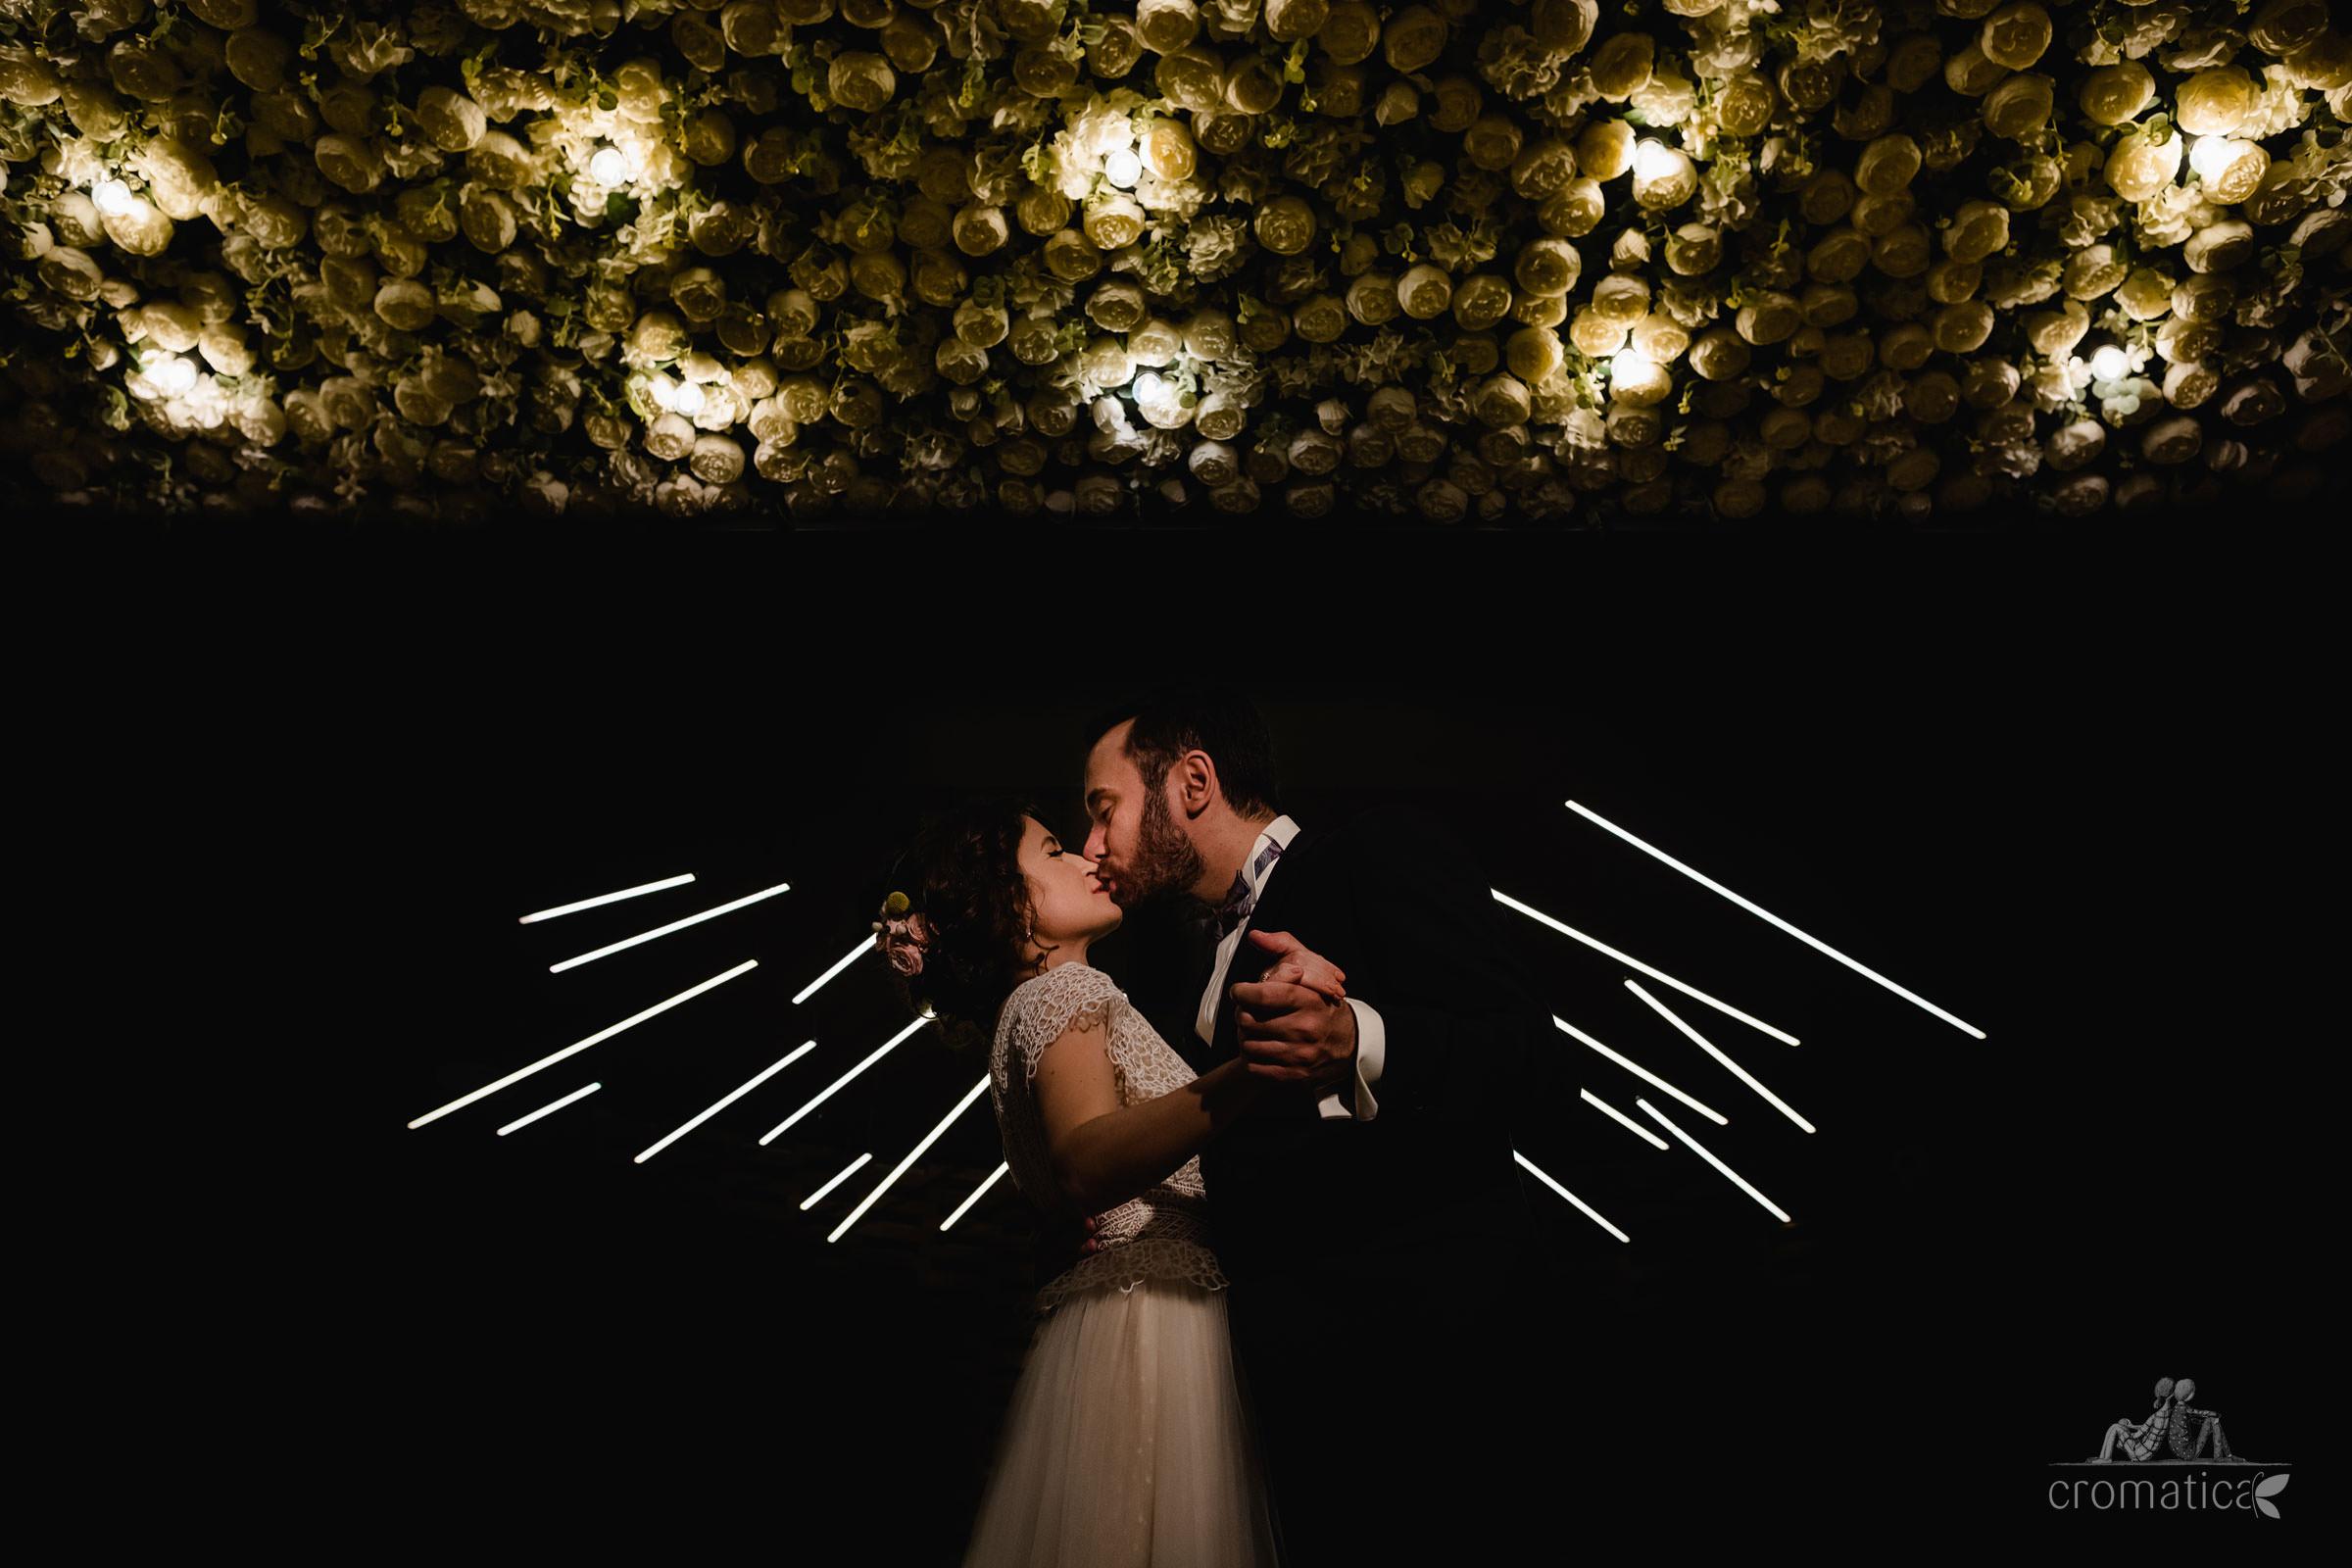 roxana mihai fotografii nunta la seratta 034